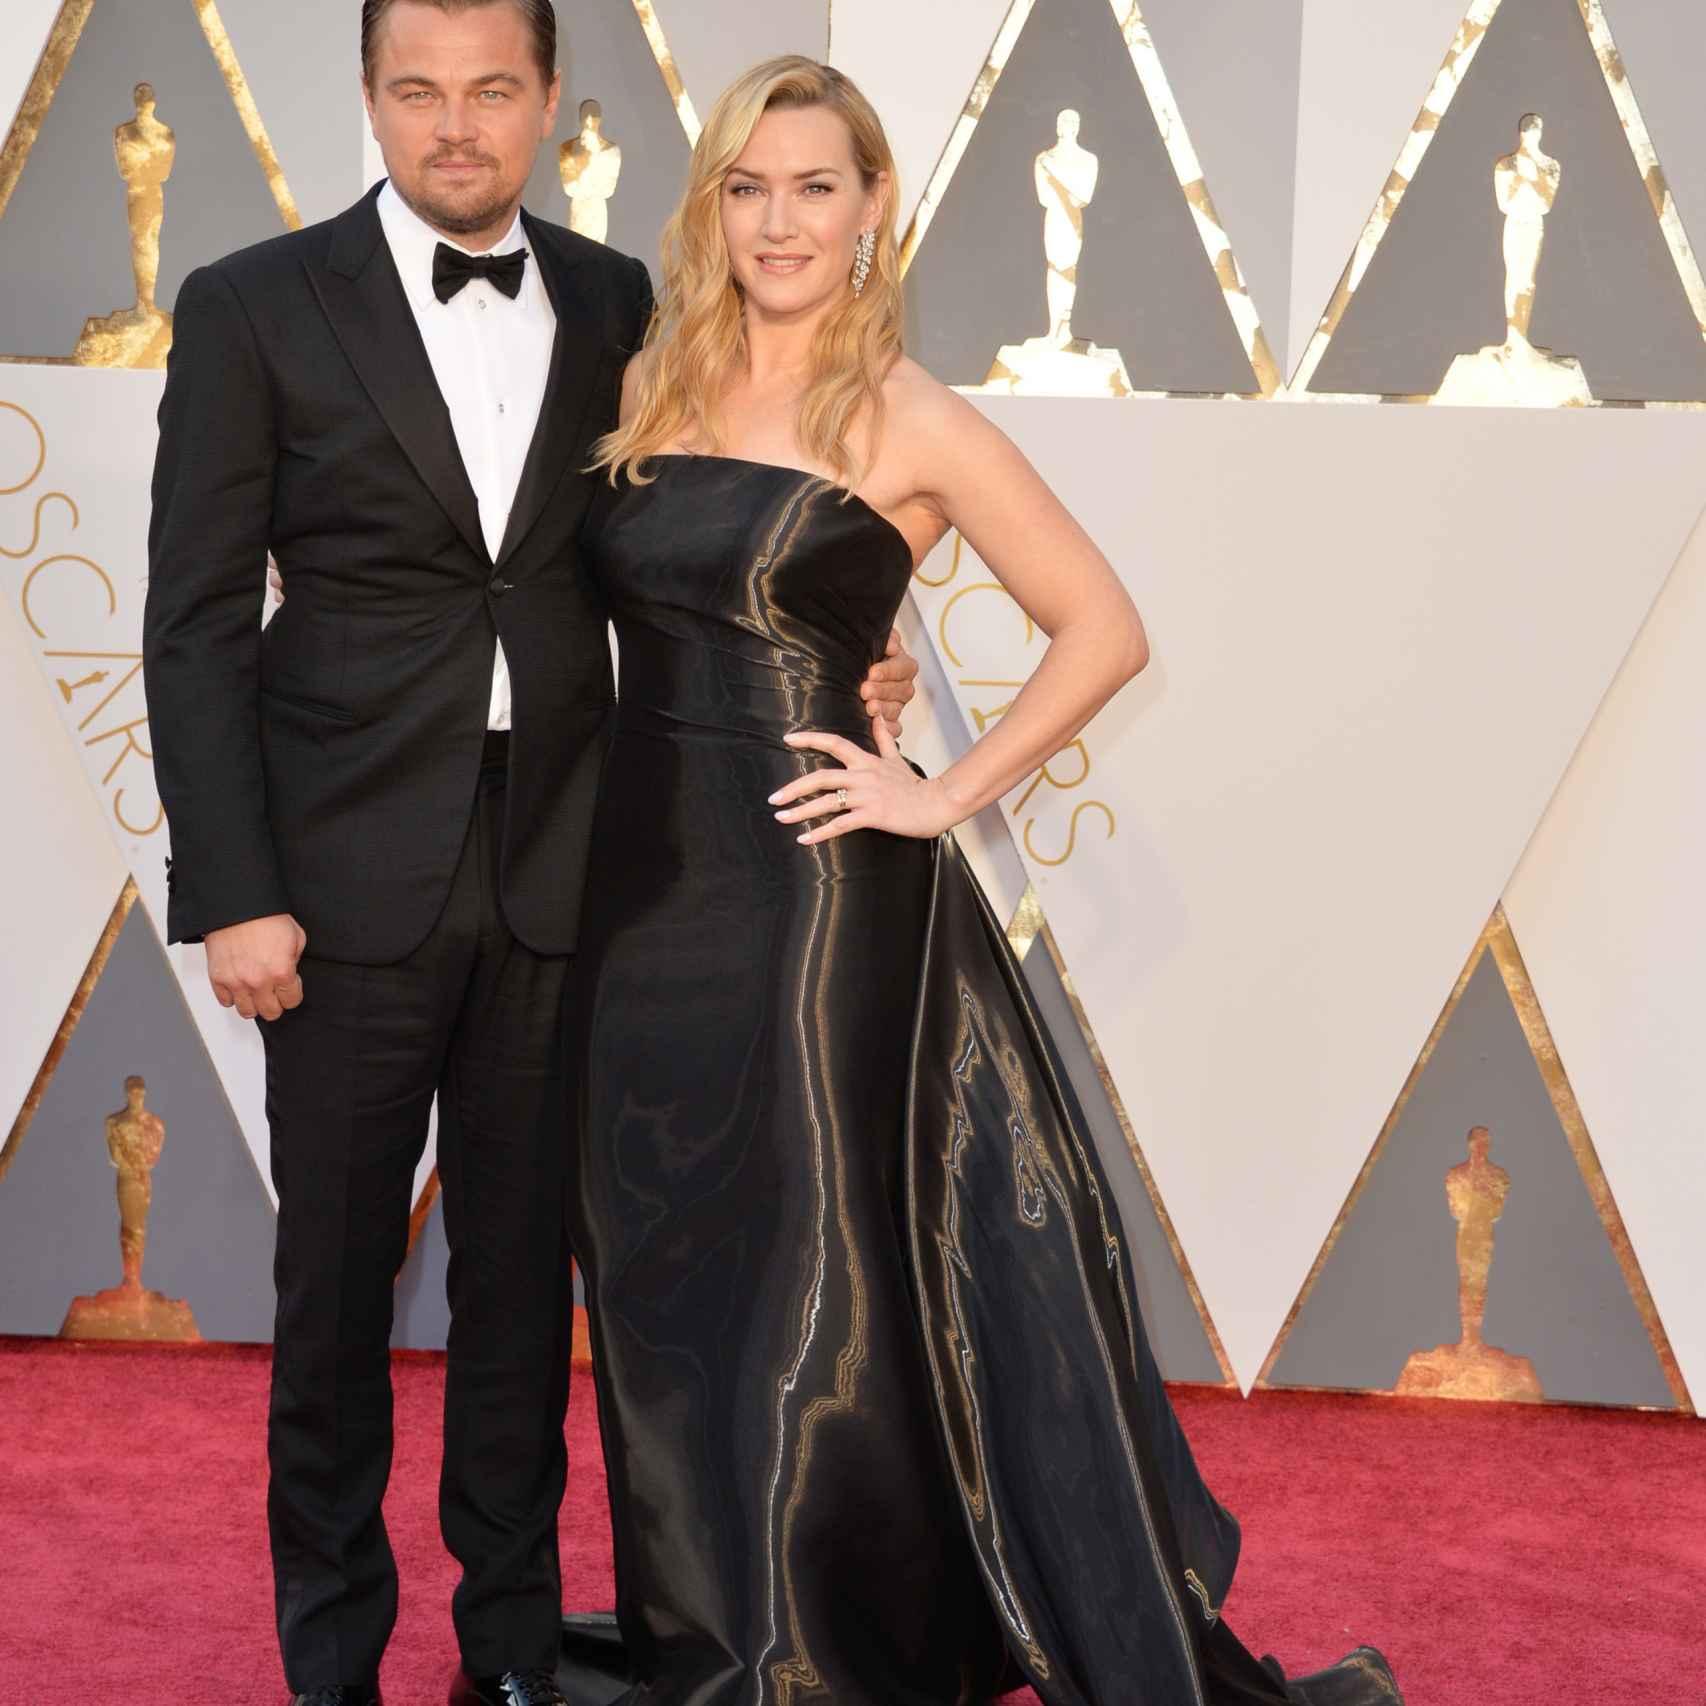 Leonardo DiCaprio con la actriz Kate Winslet